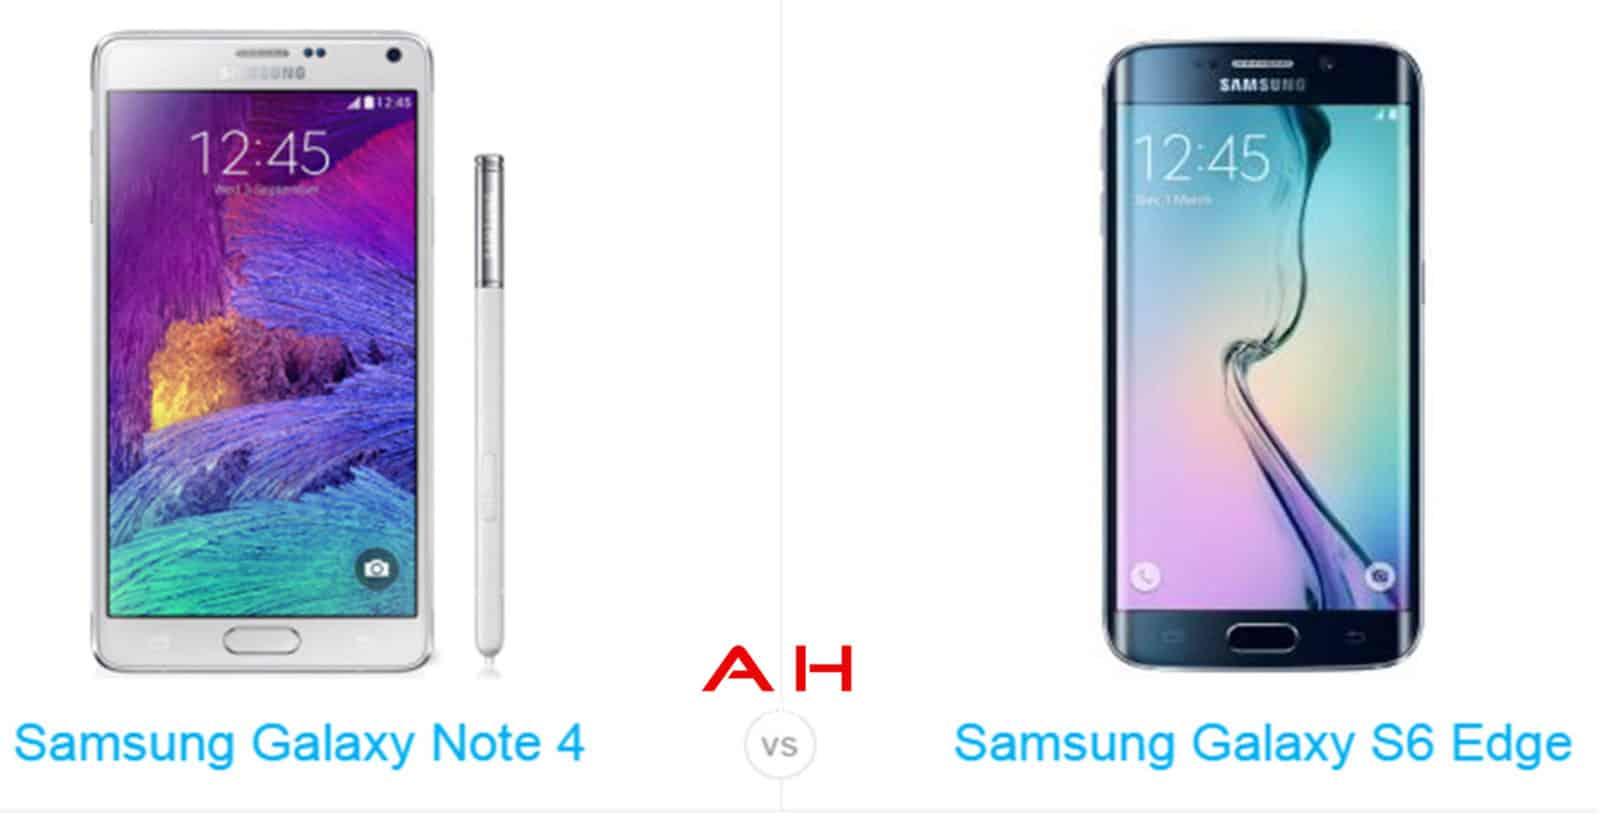 Galaxy s6 Edge vs Galaxy Note 4 cam AH